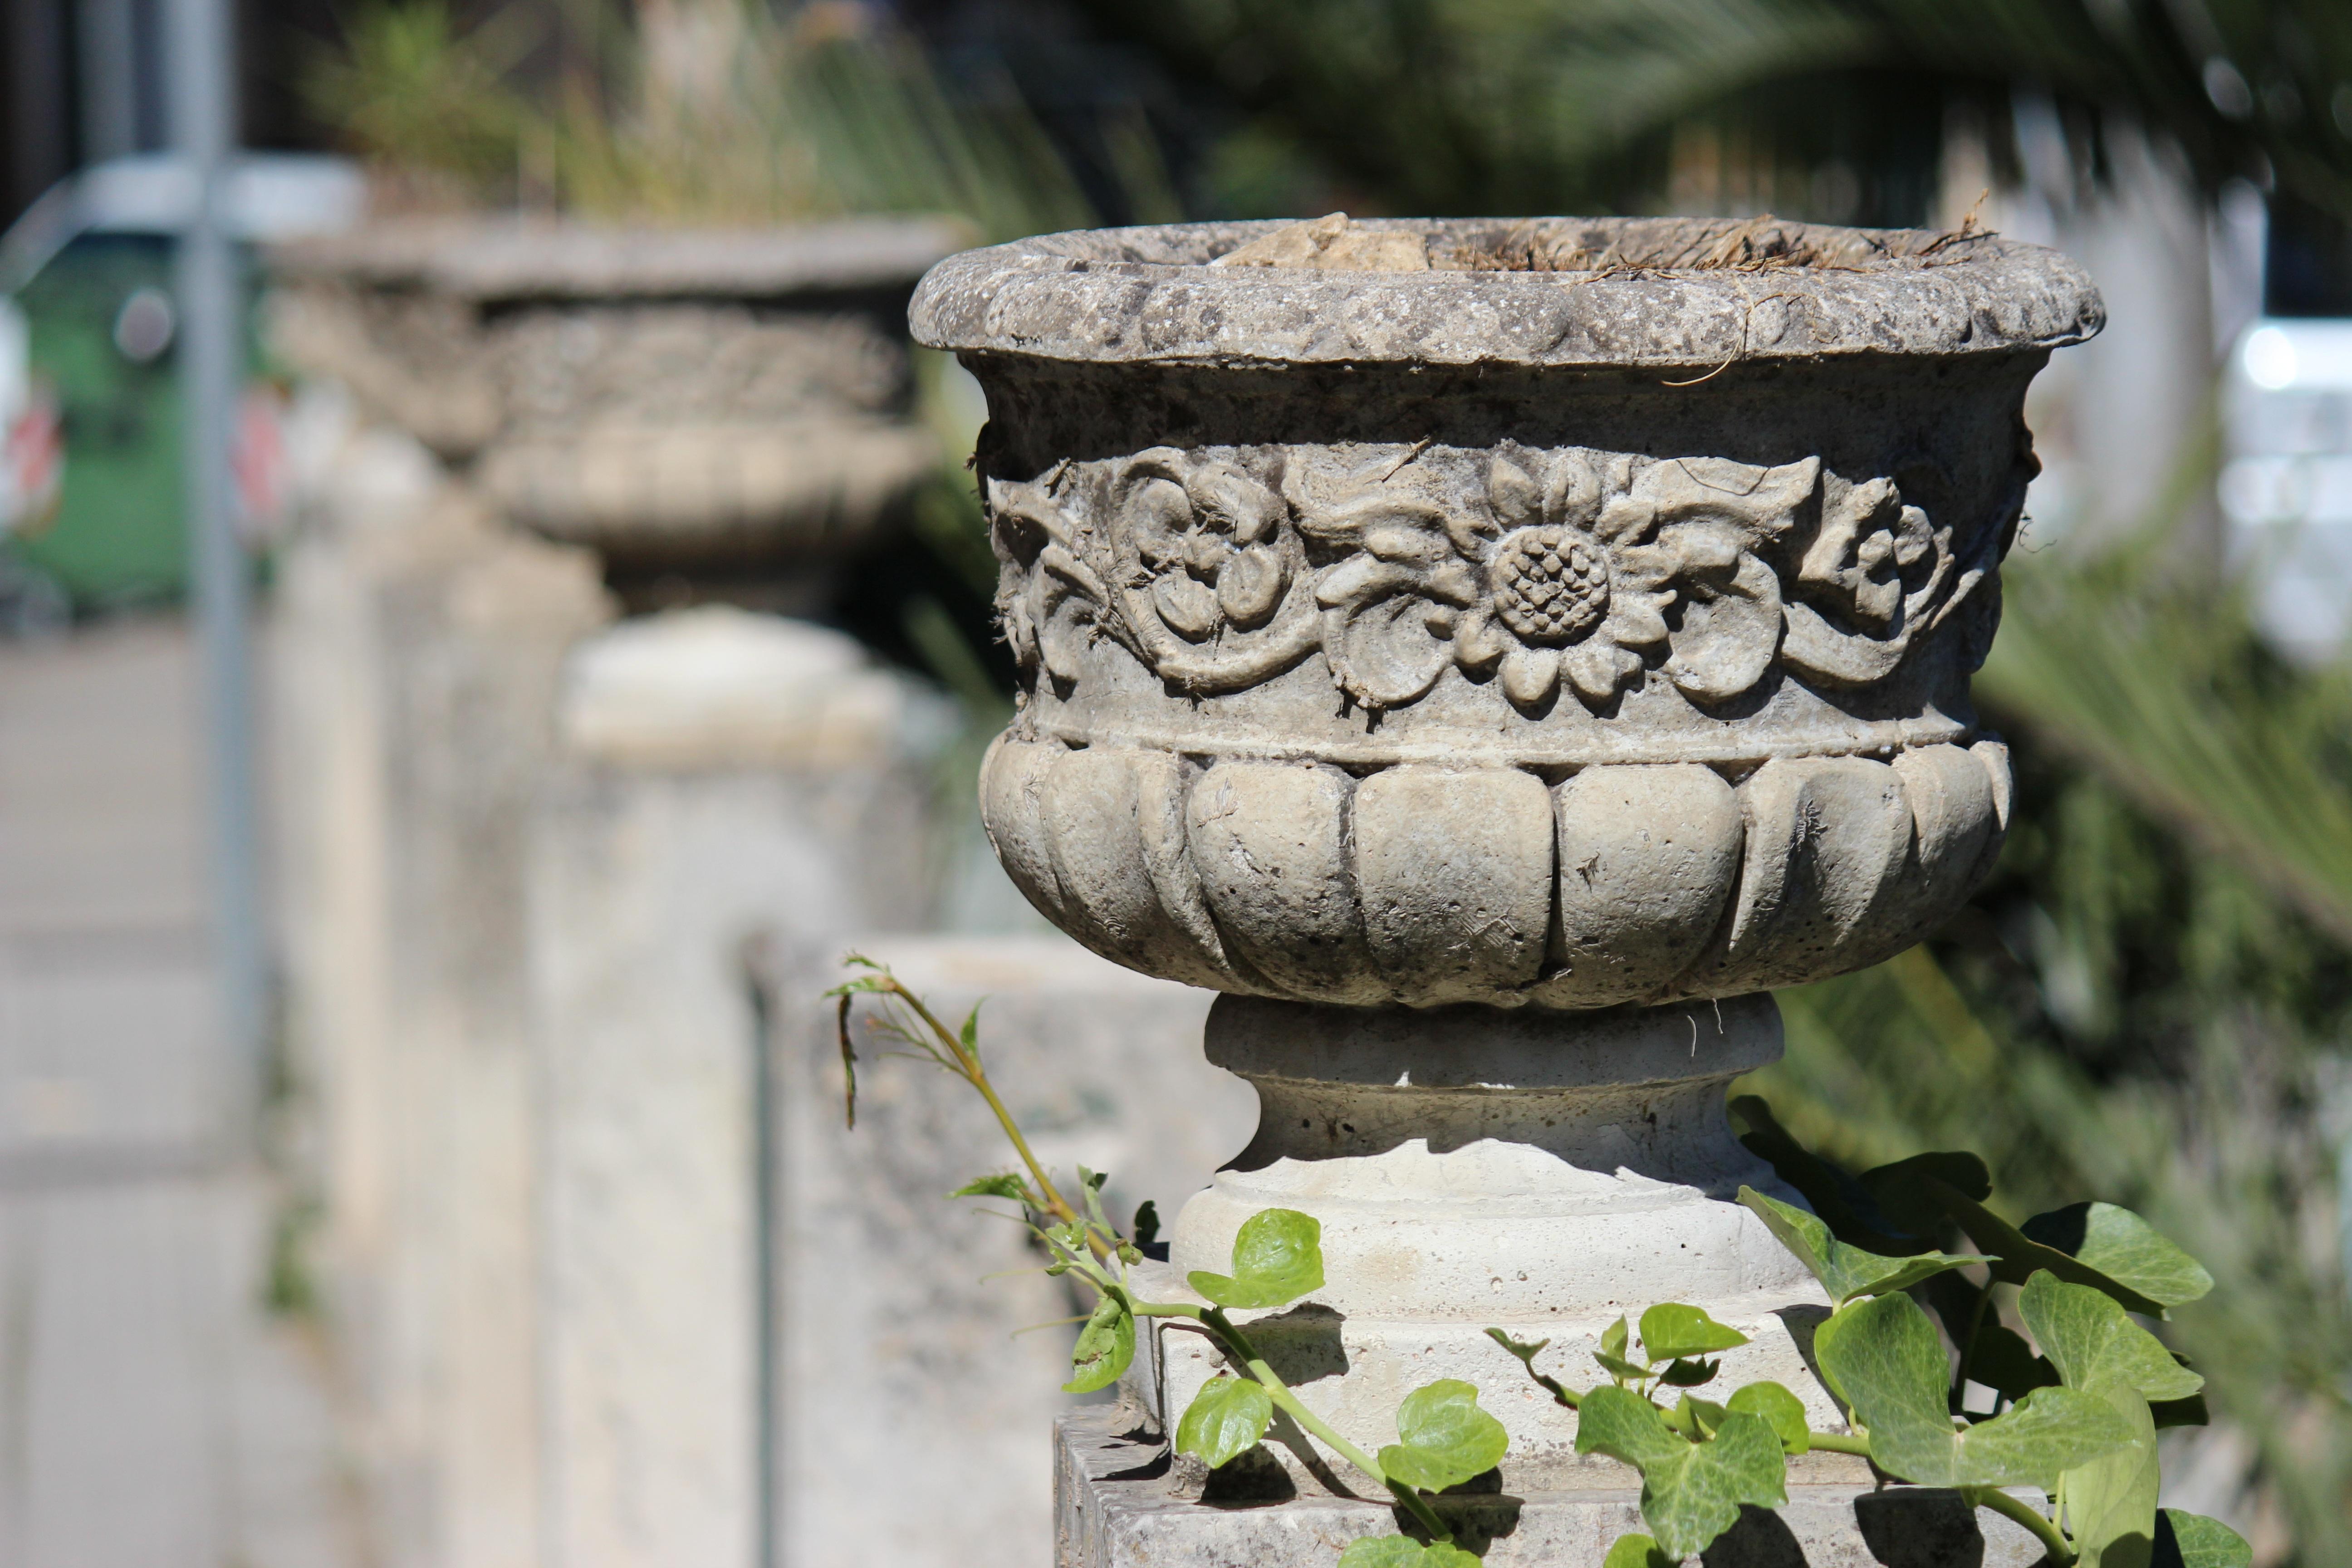 Gambar Pohon Menanam Kayu Bunga Batu Patung Vas Hijau Ivy Penanam Taman Penerangan Seni Candi Langkan